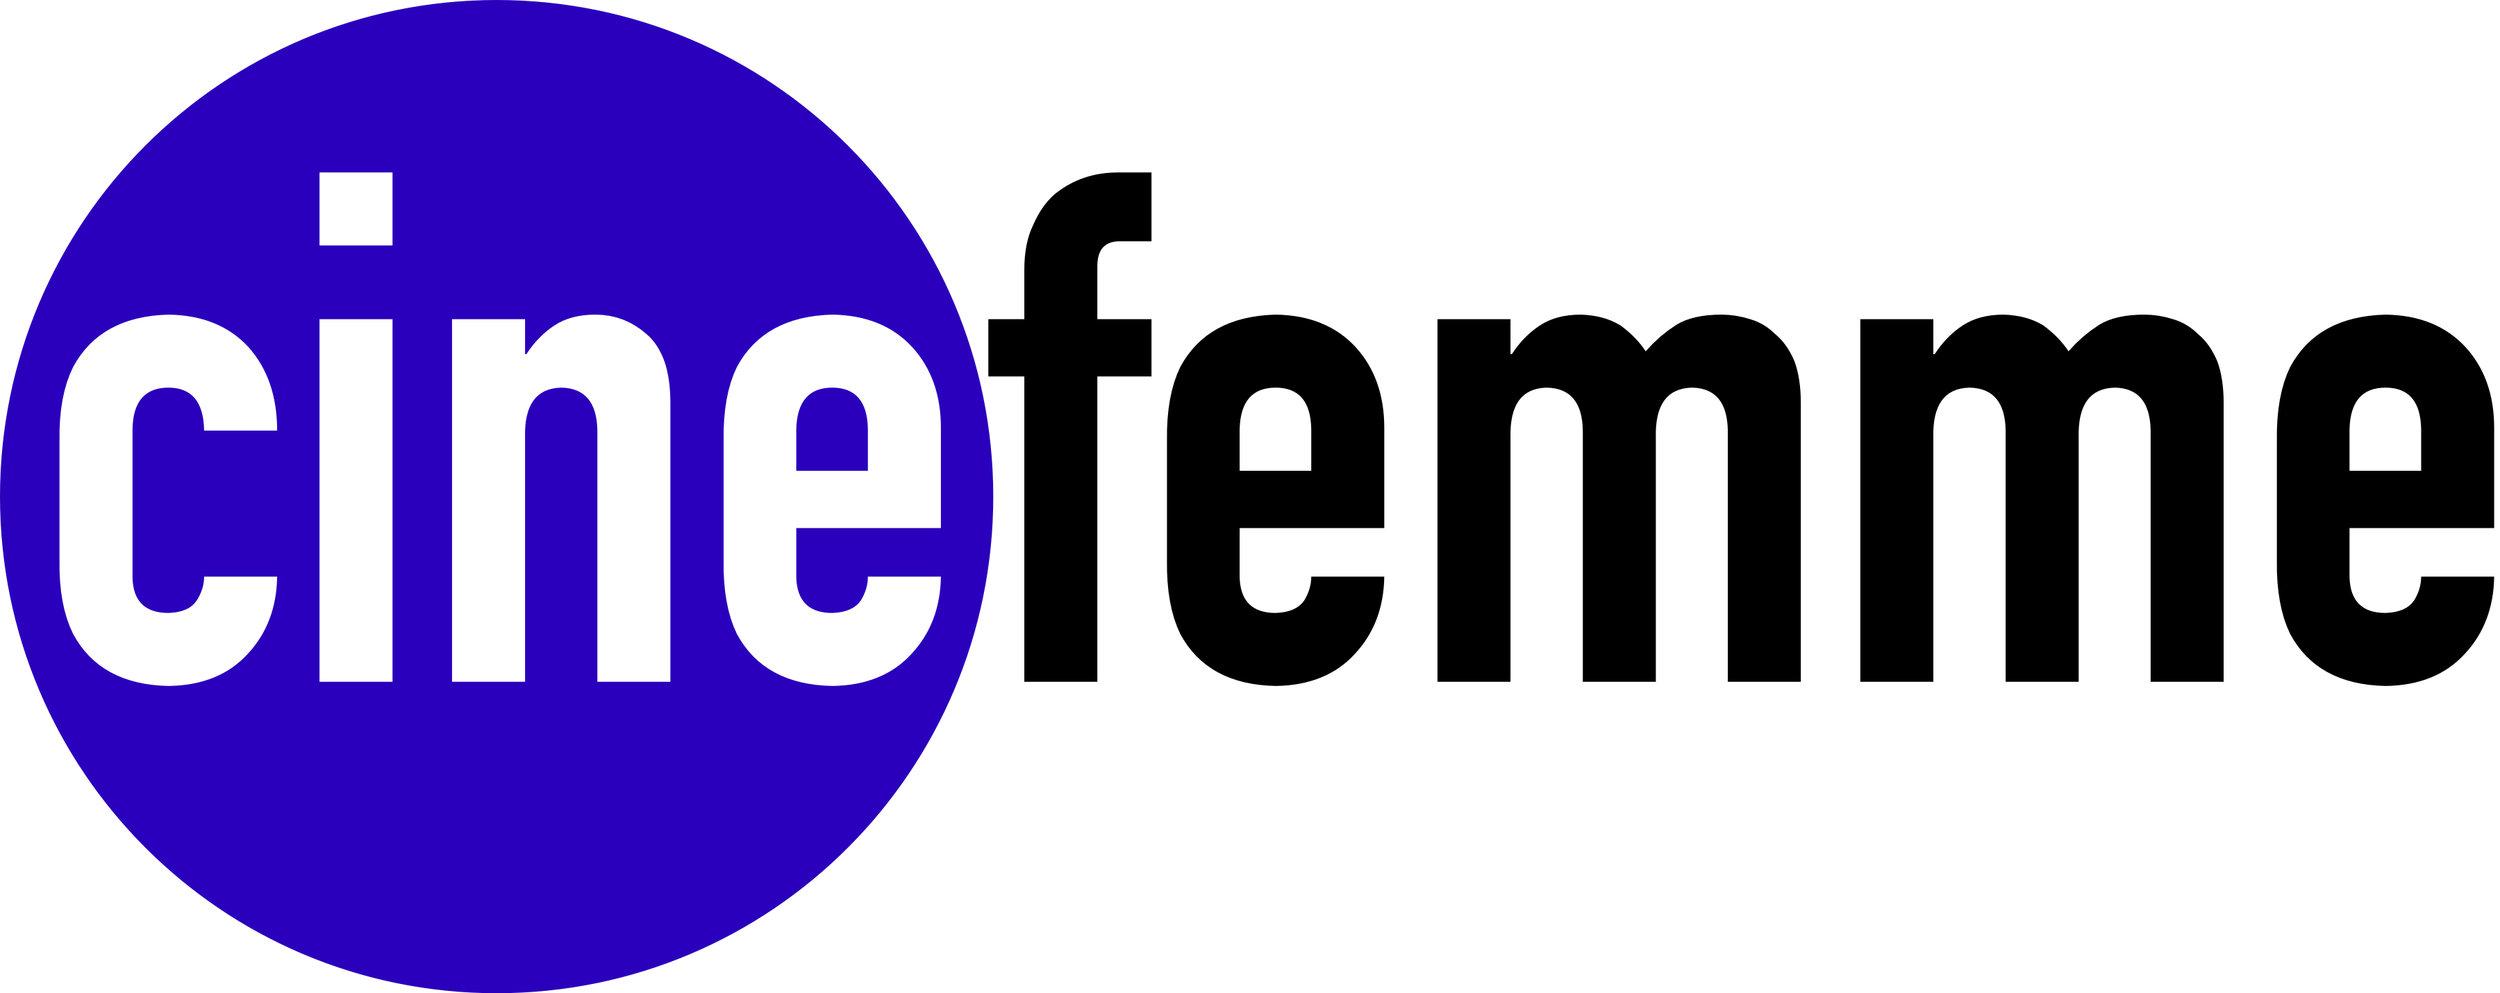 cinefemme_logo.jpg